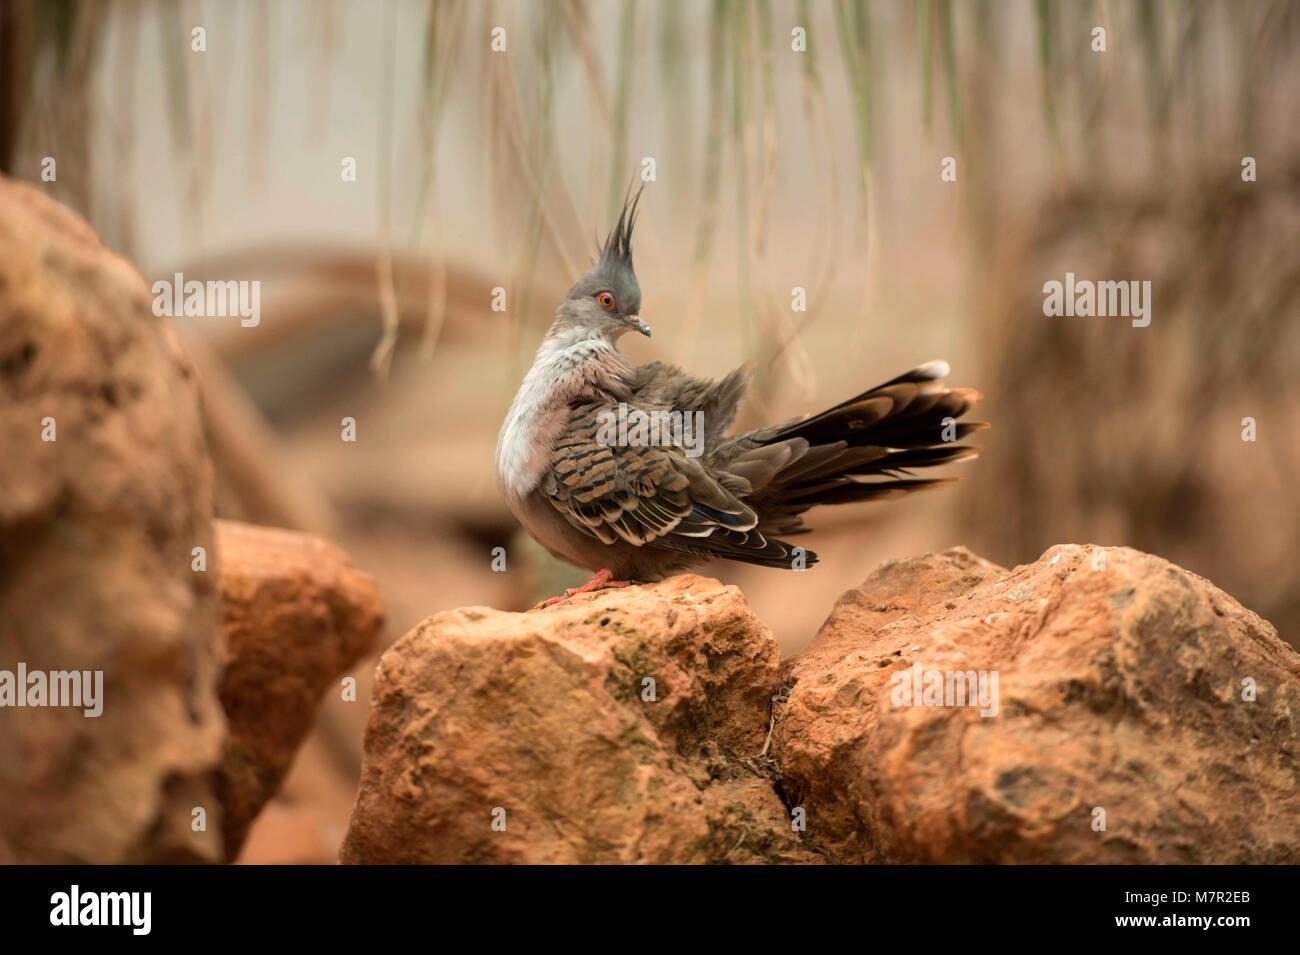 Australian Gems - Diamond Dove (Geopelia cuneata) Portrait Collection - Stock Image